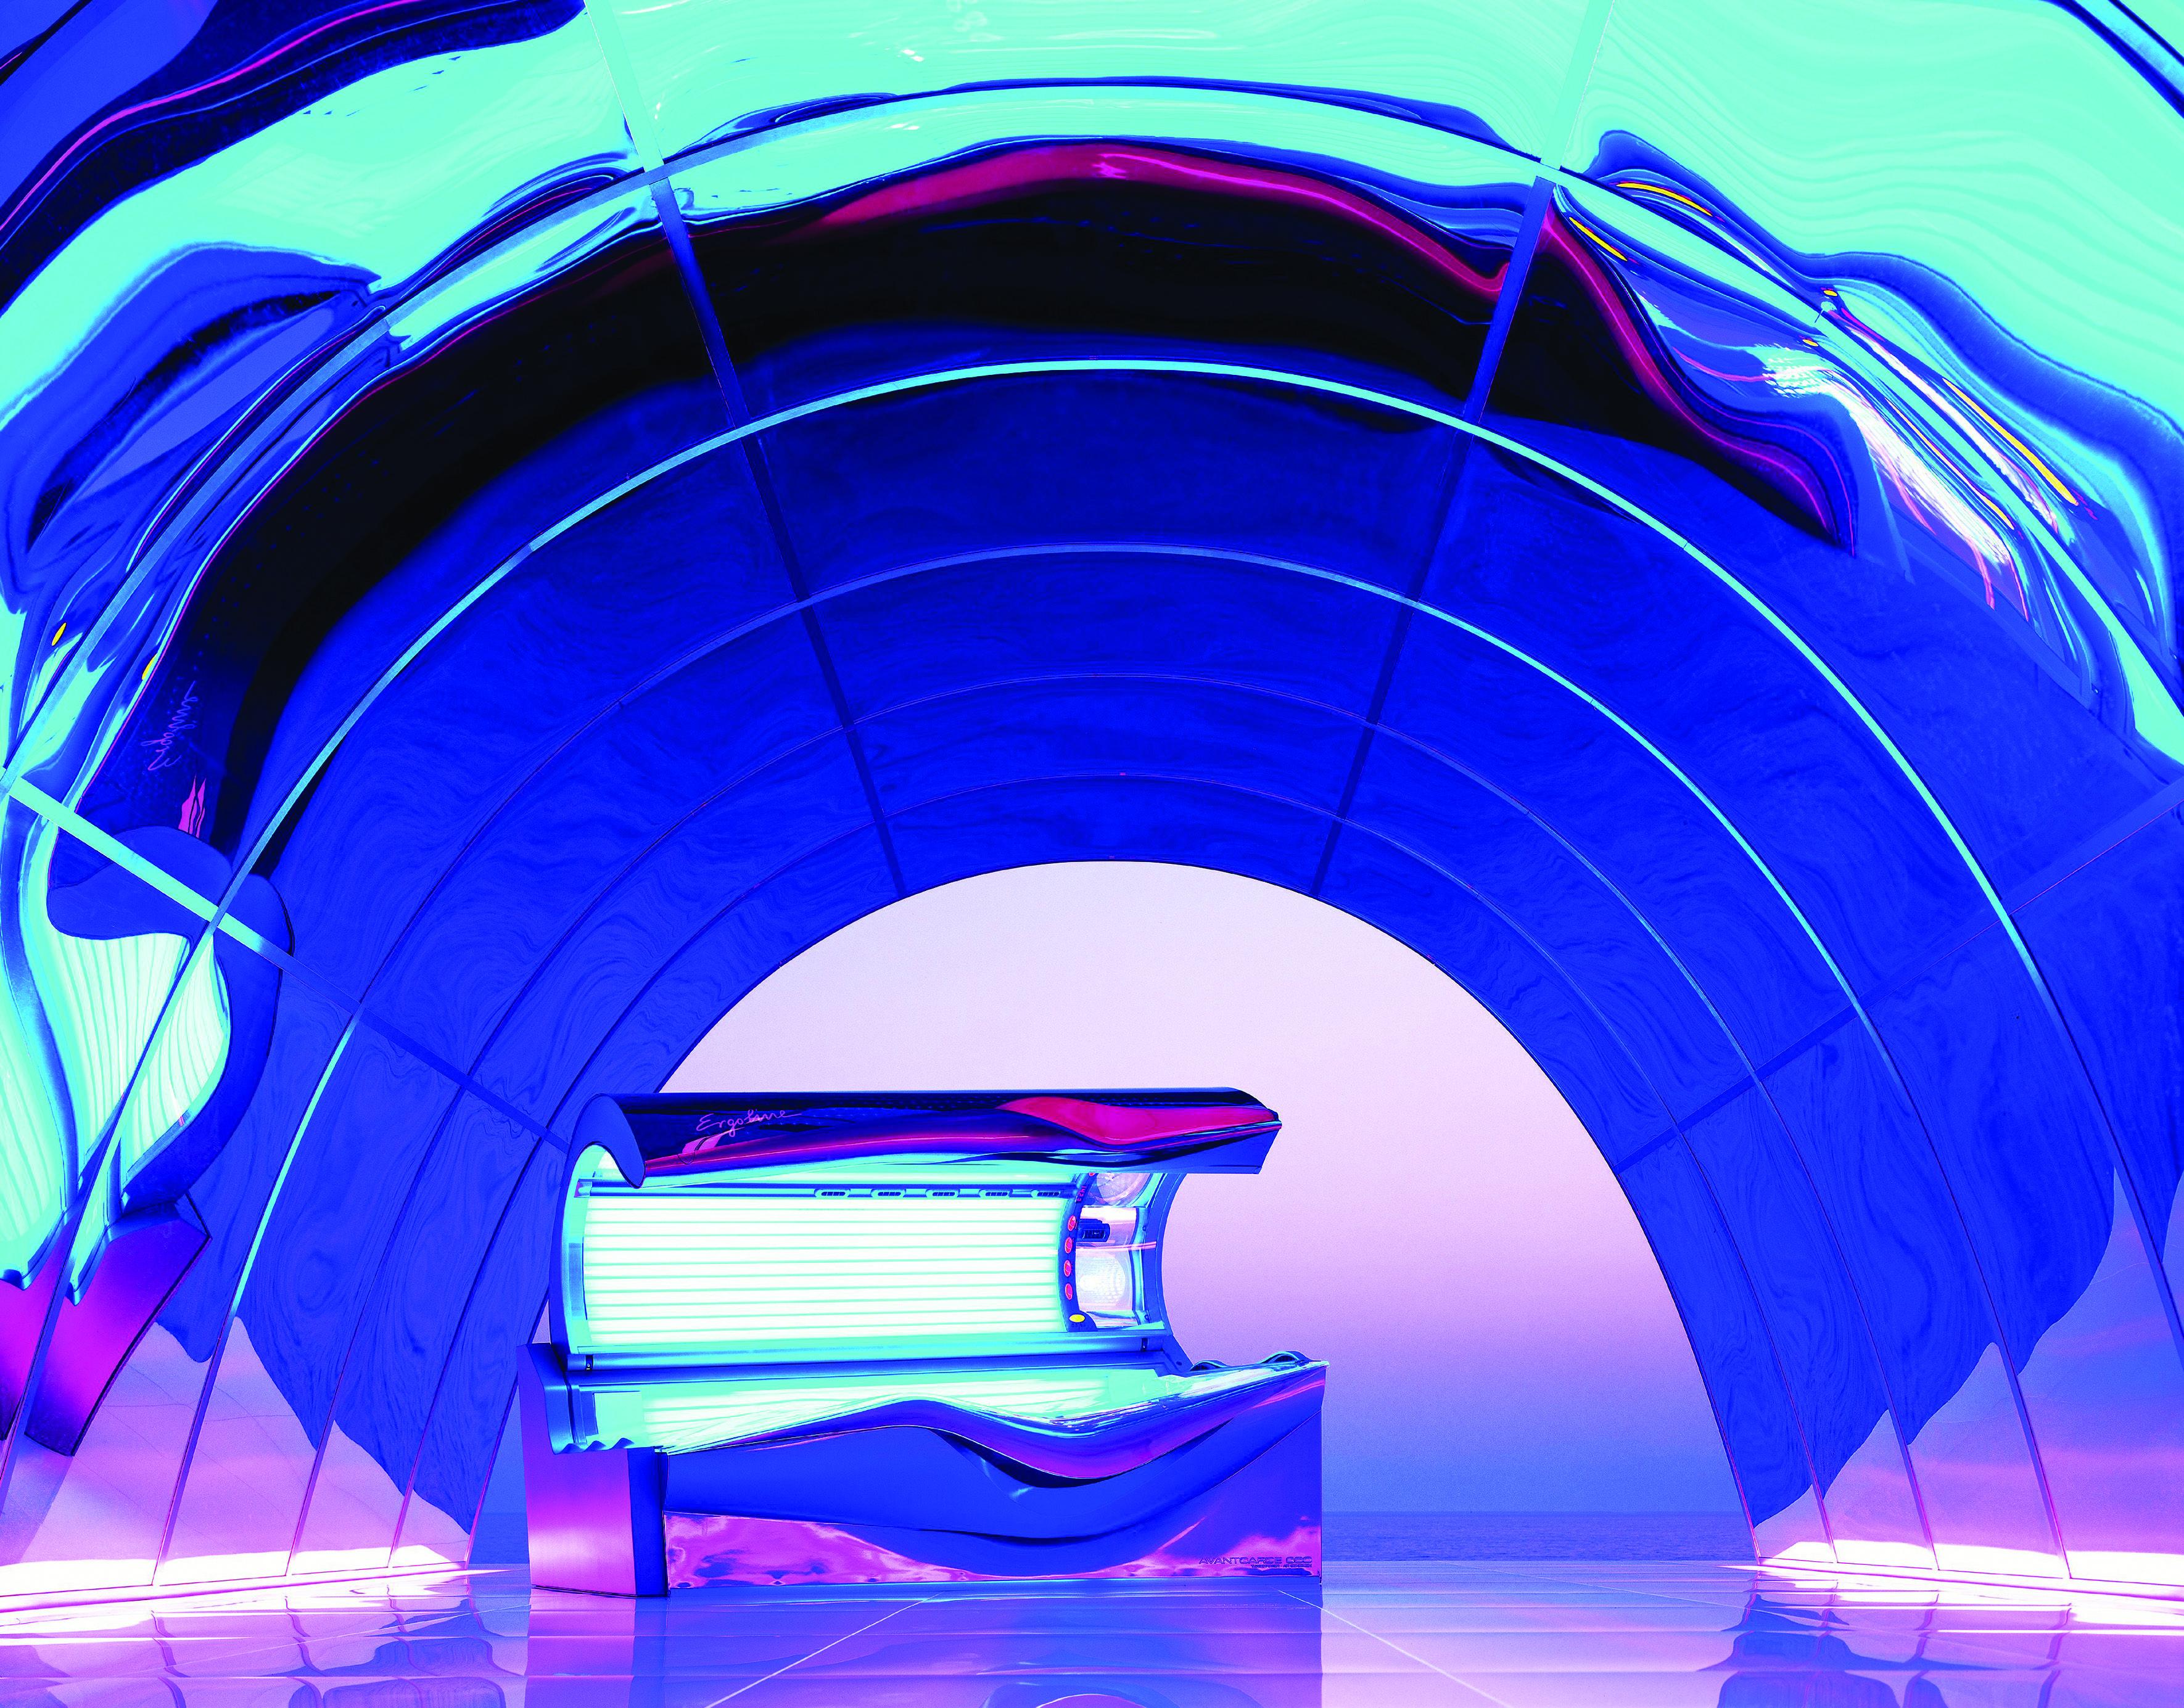 Ergoline Avantgarde Tanning bed, Uv tanning beds